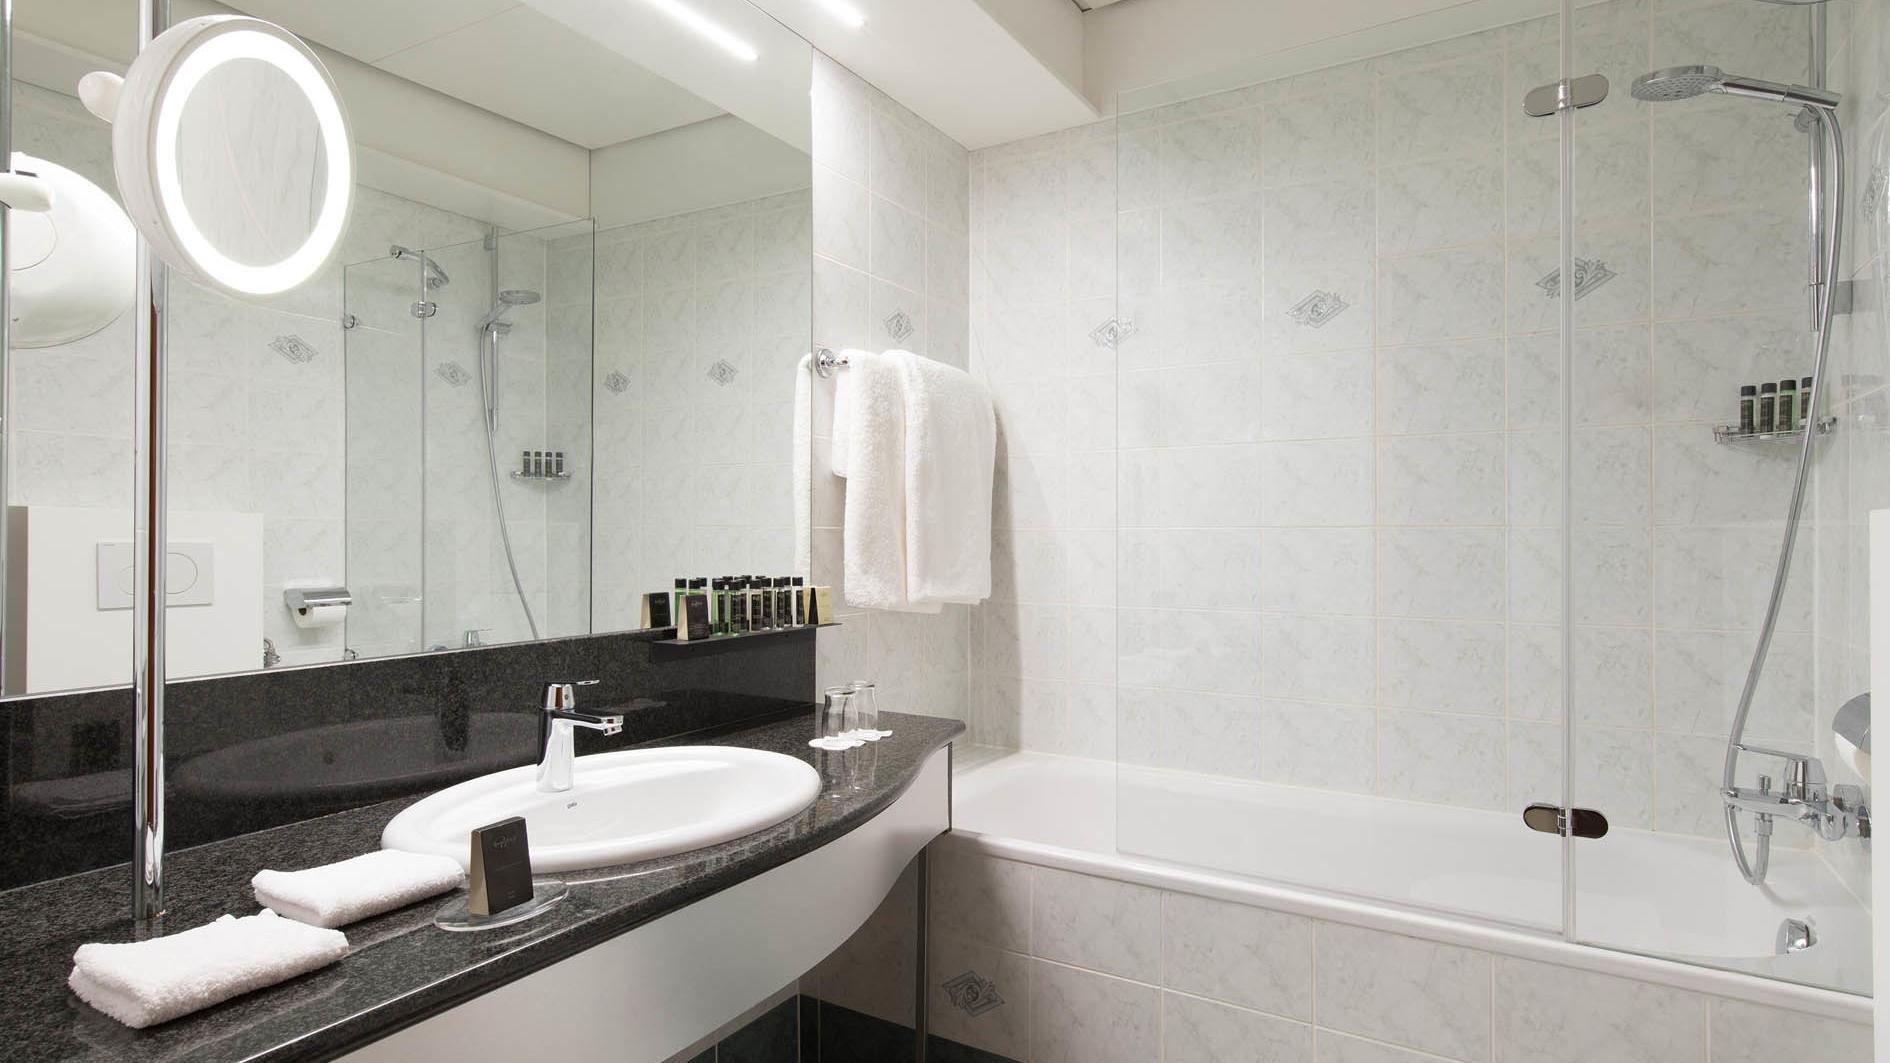 Deluxe Suite Bathroom at Grand Hotel Union in Ljubljana